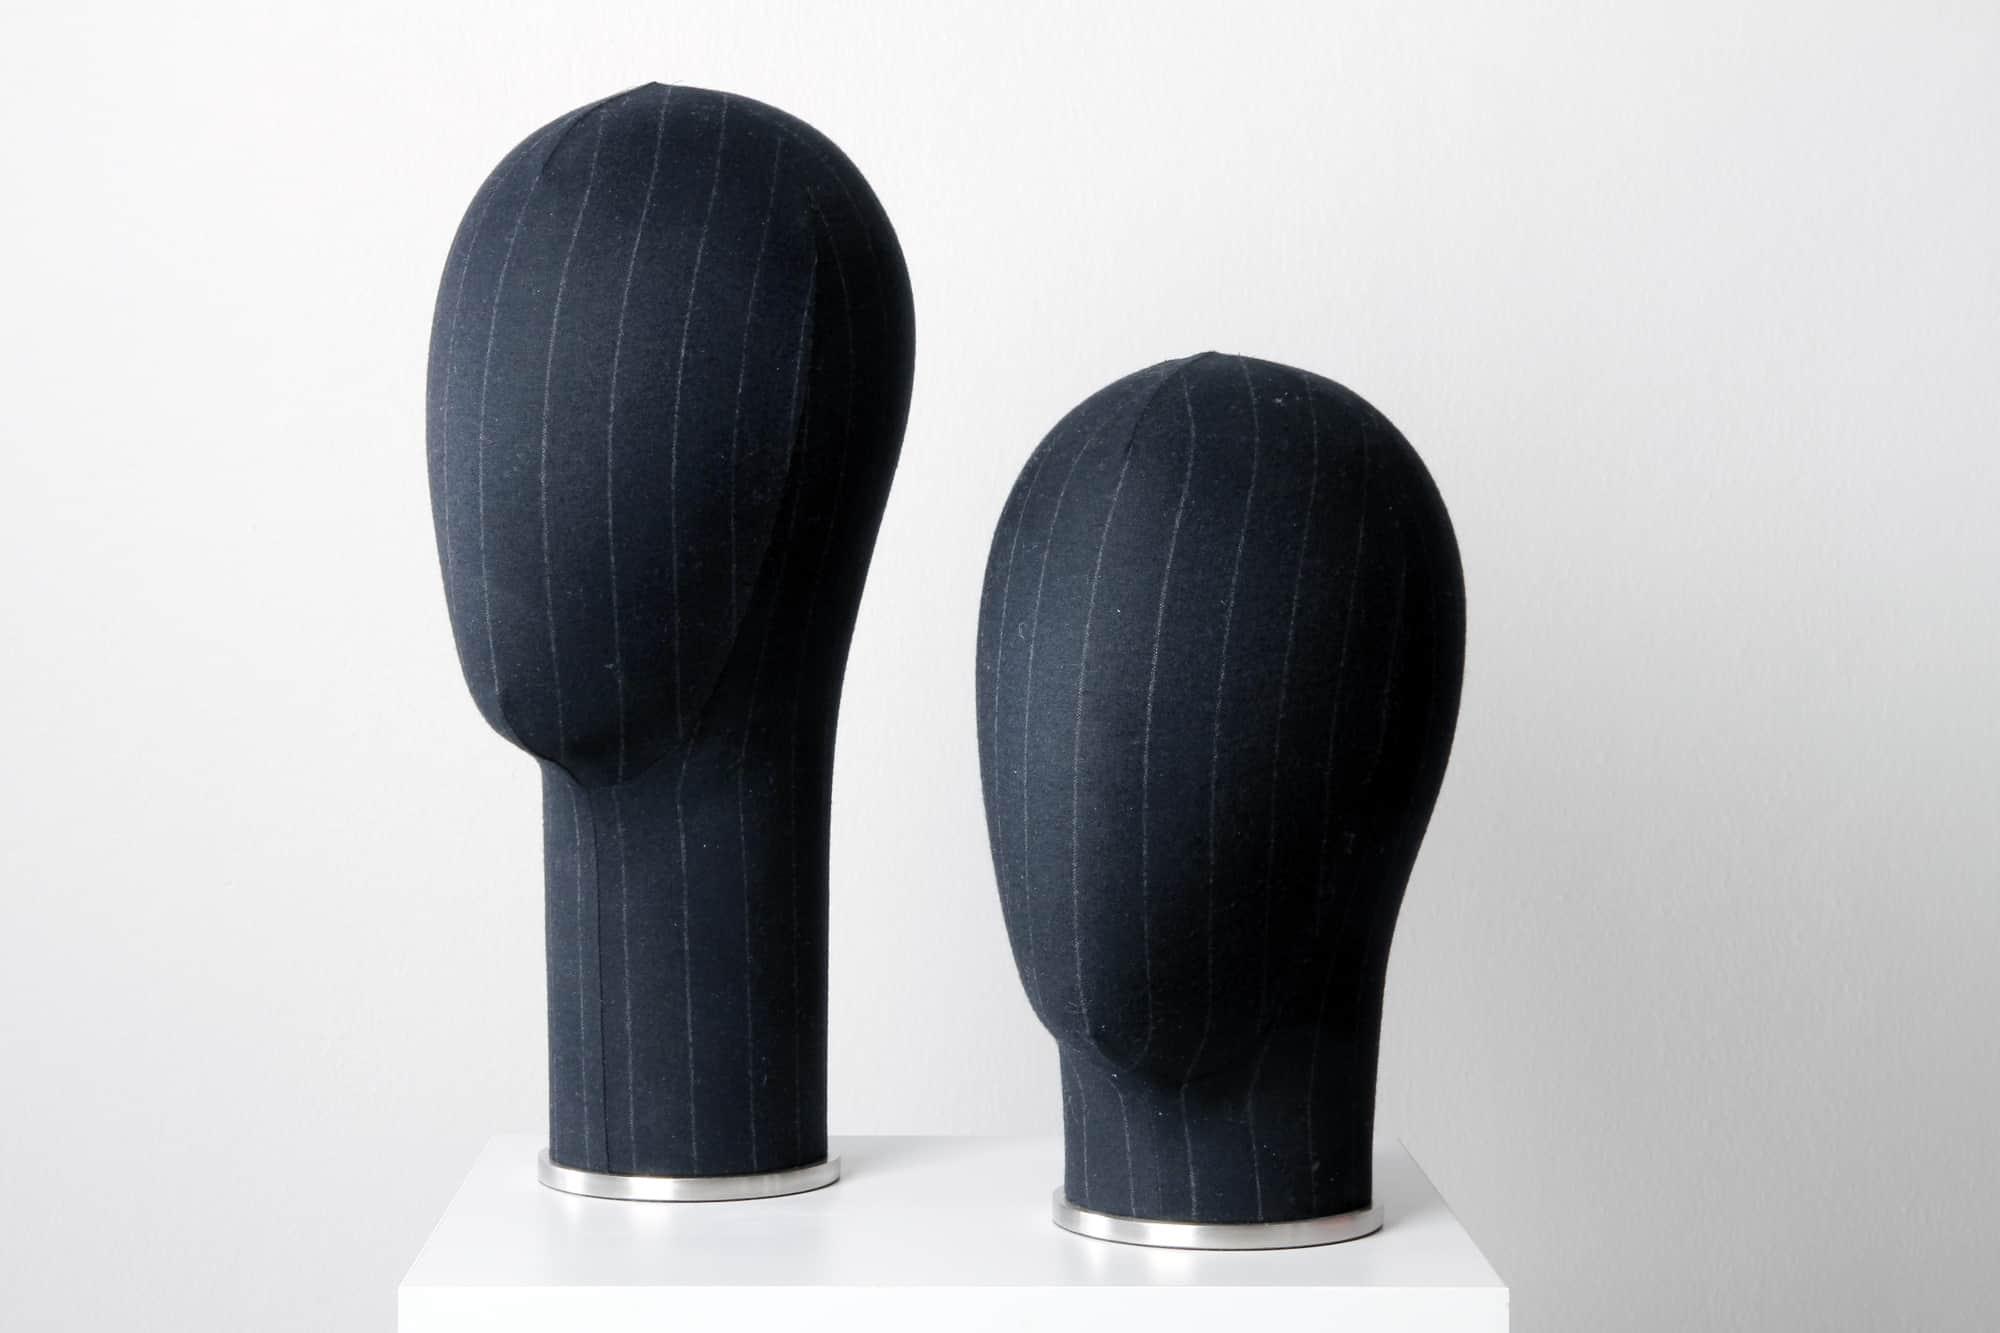 bonaveri bust forms mannequins sartorial 10